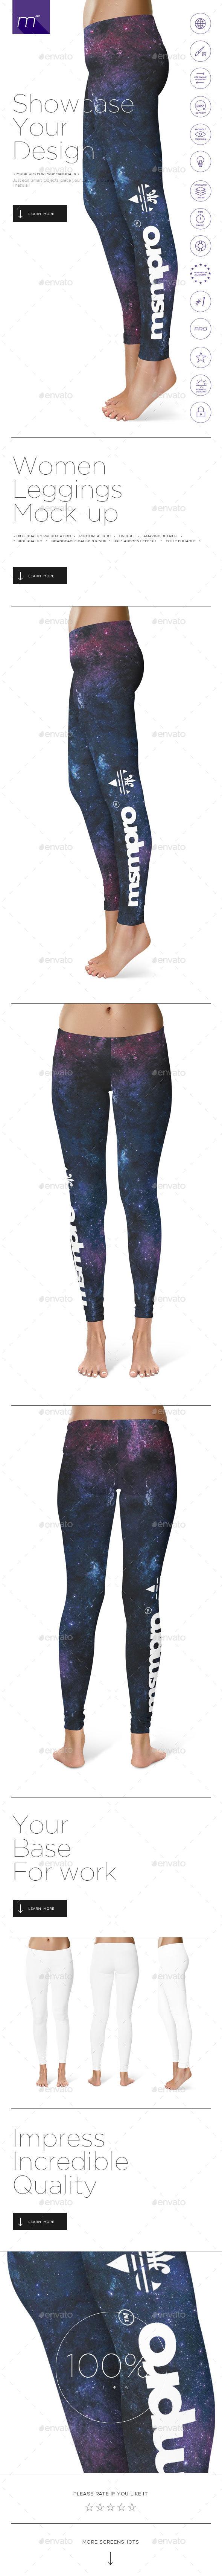 leggings mock up psd template mesmeriseme pants click here to